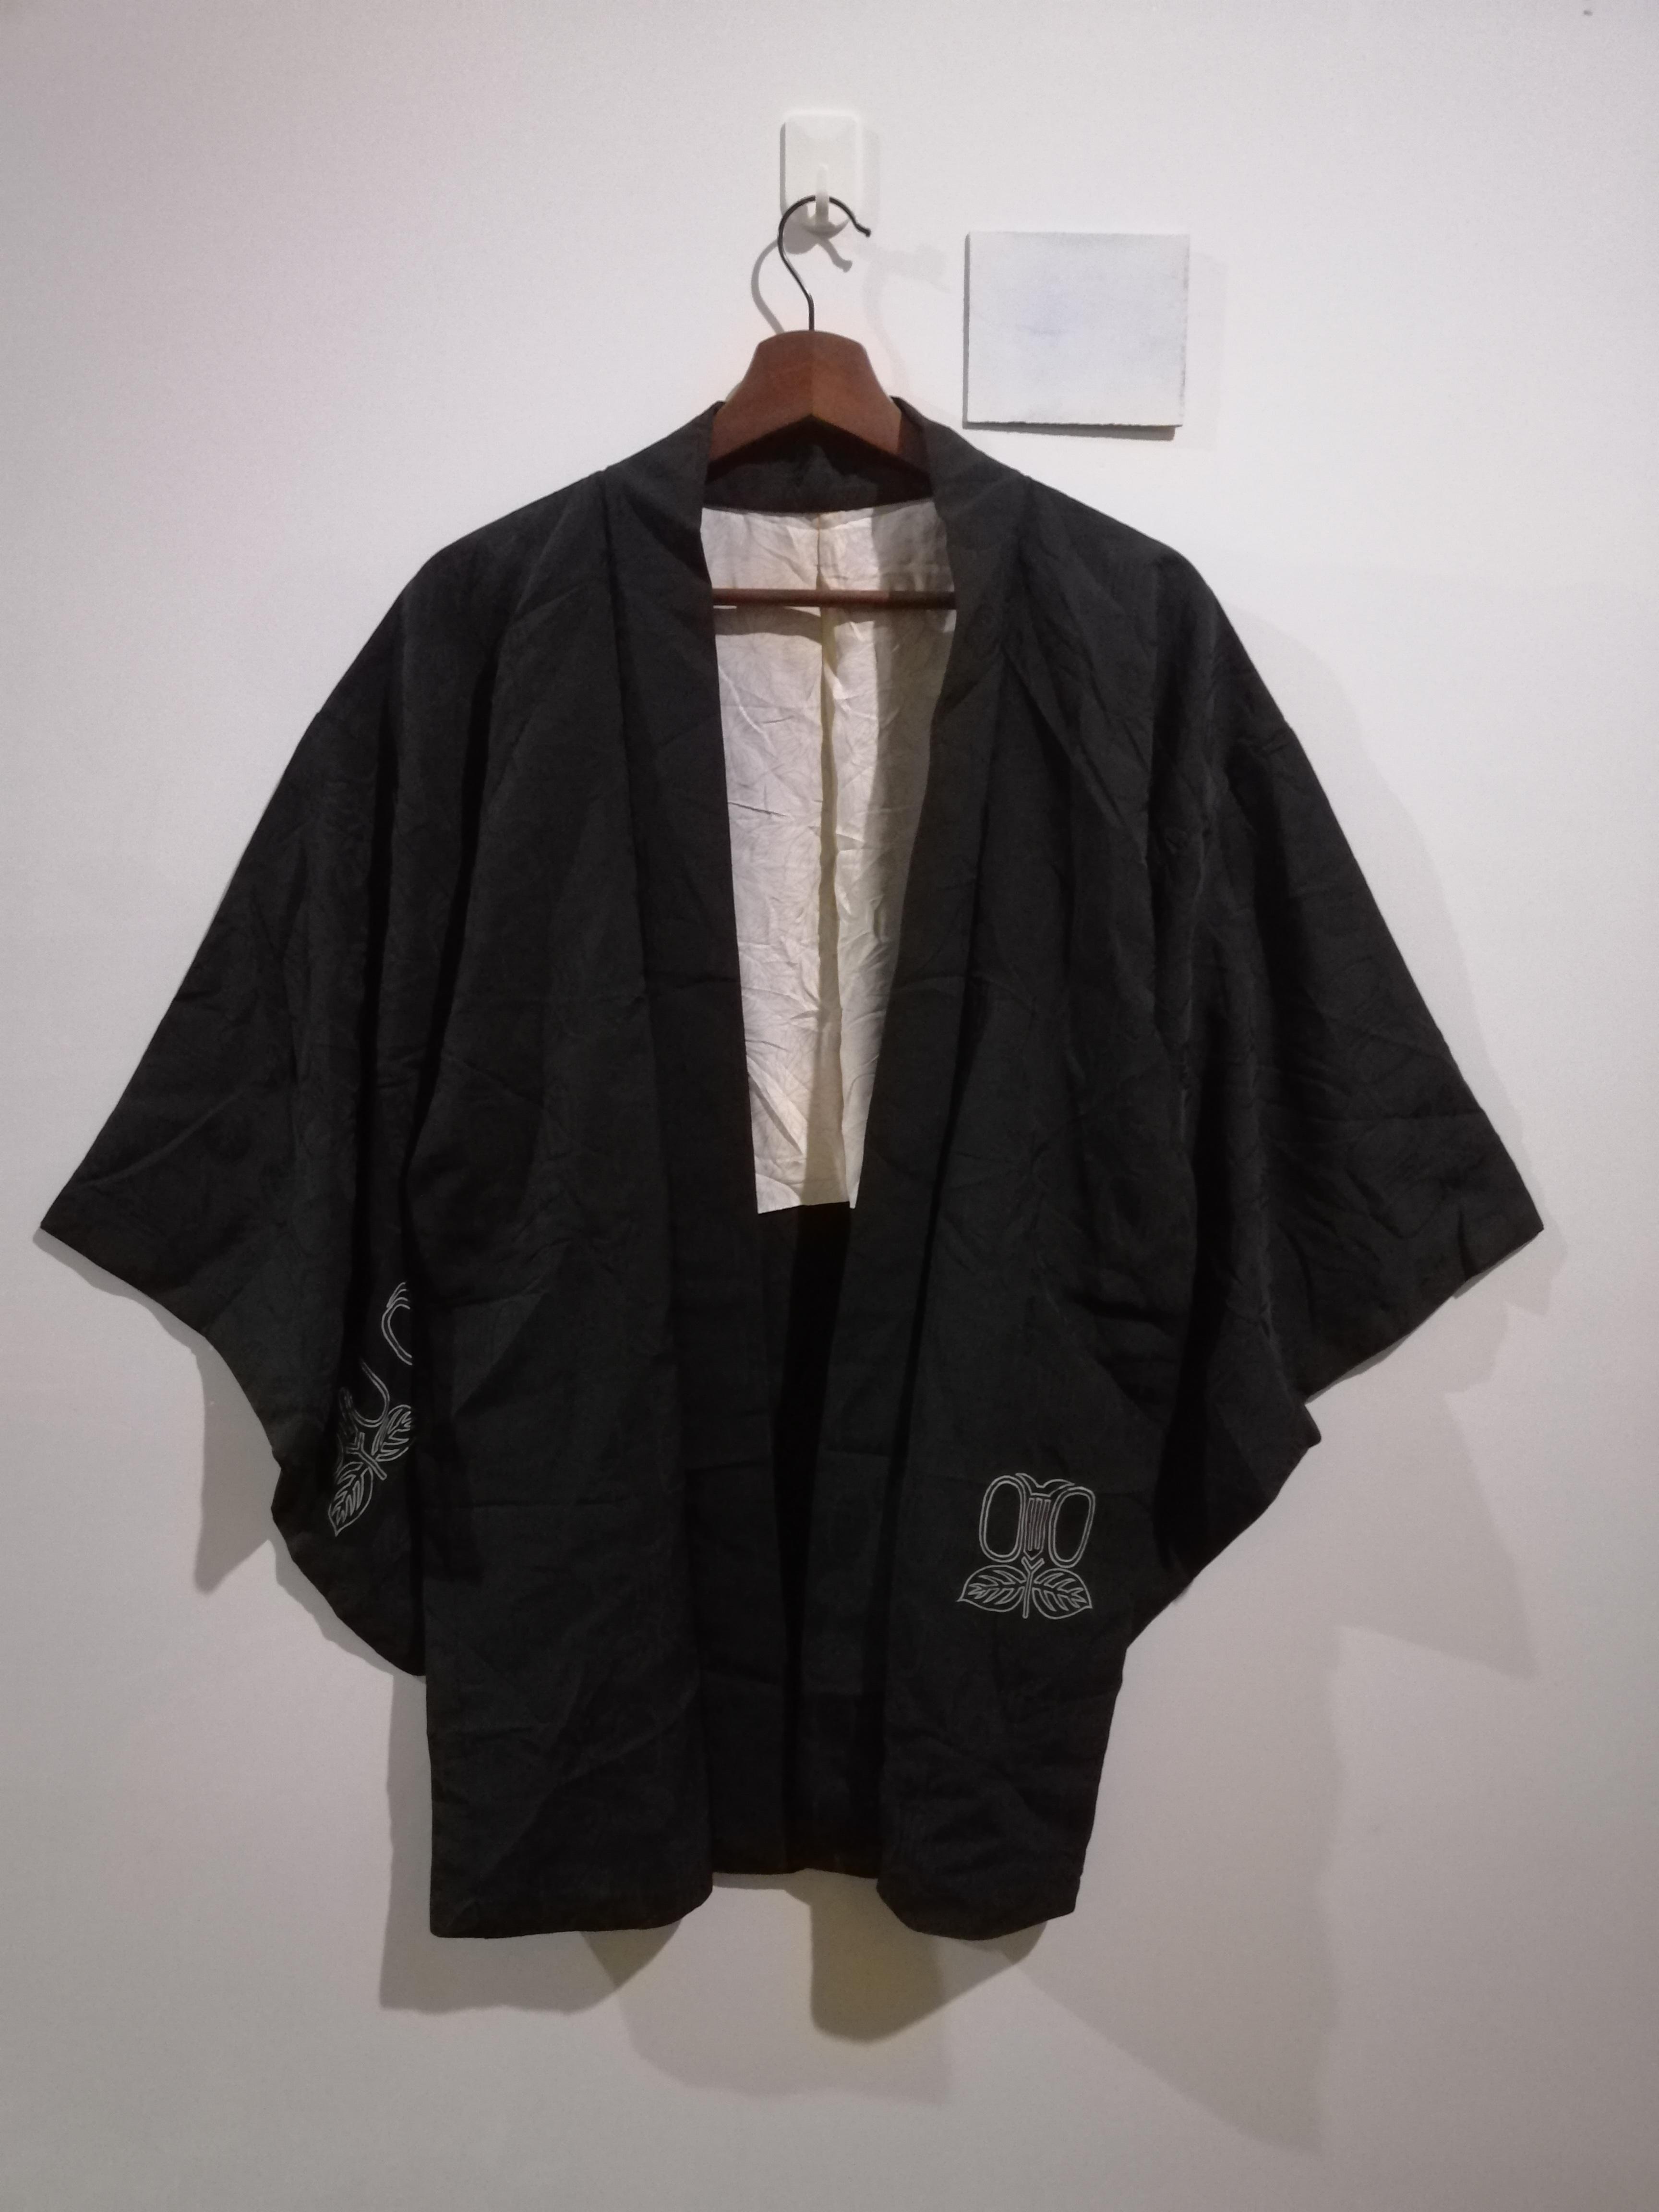 Vintage Noragi Kimono Haori Hanten Jinbei Japanese  Cardigan Happi Jacket B714 Purple Robe Dress FREE SHIPPING